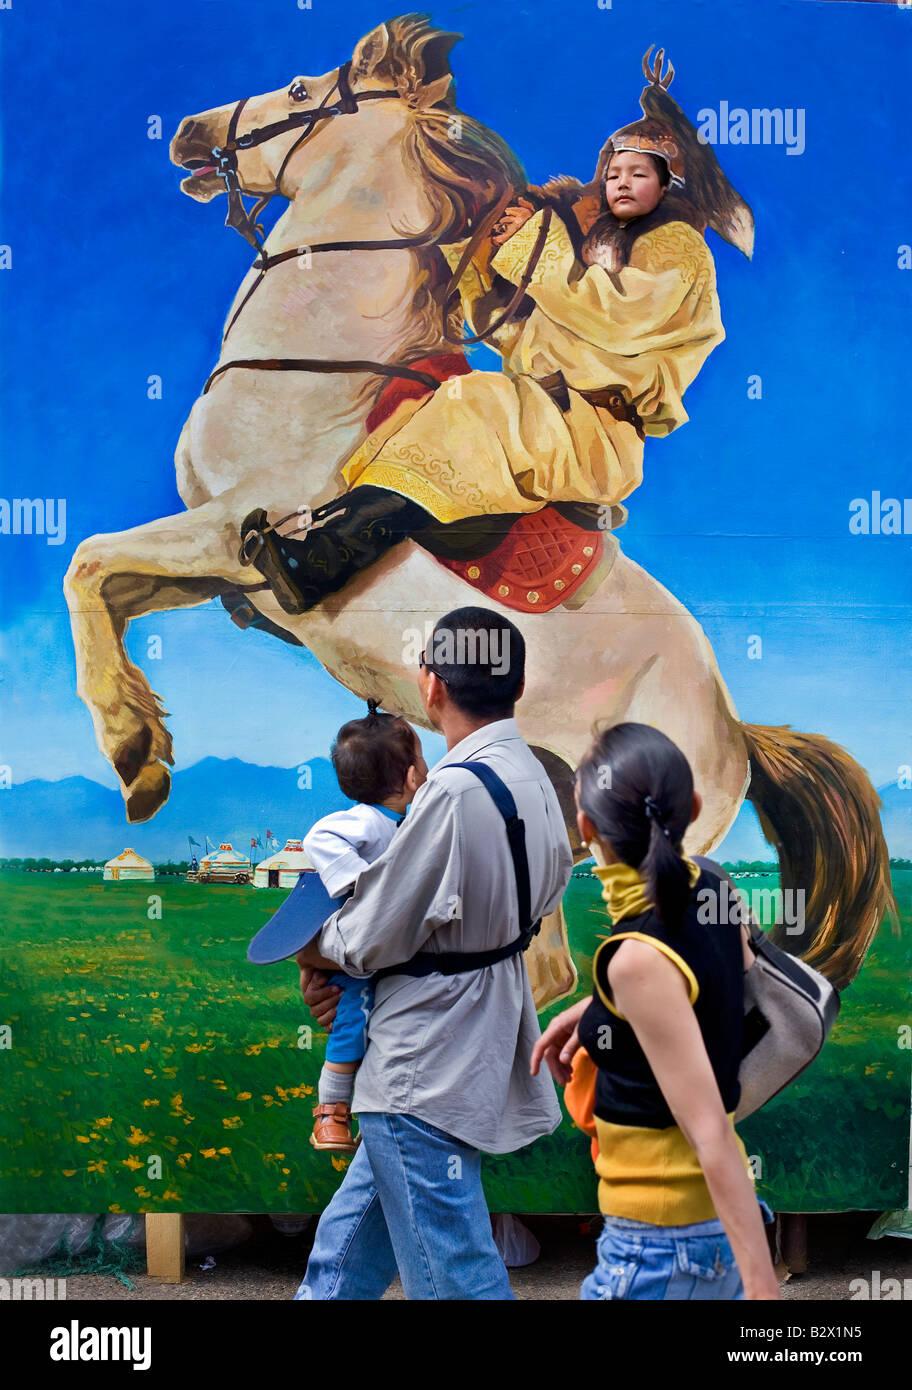 Genghis Khan photobooth outside the National Stadium in Ulaanbaatar, Mongolia - Stock Image